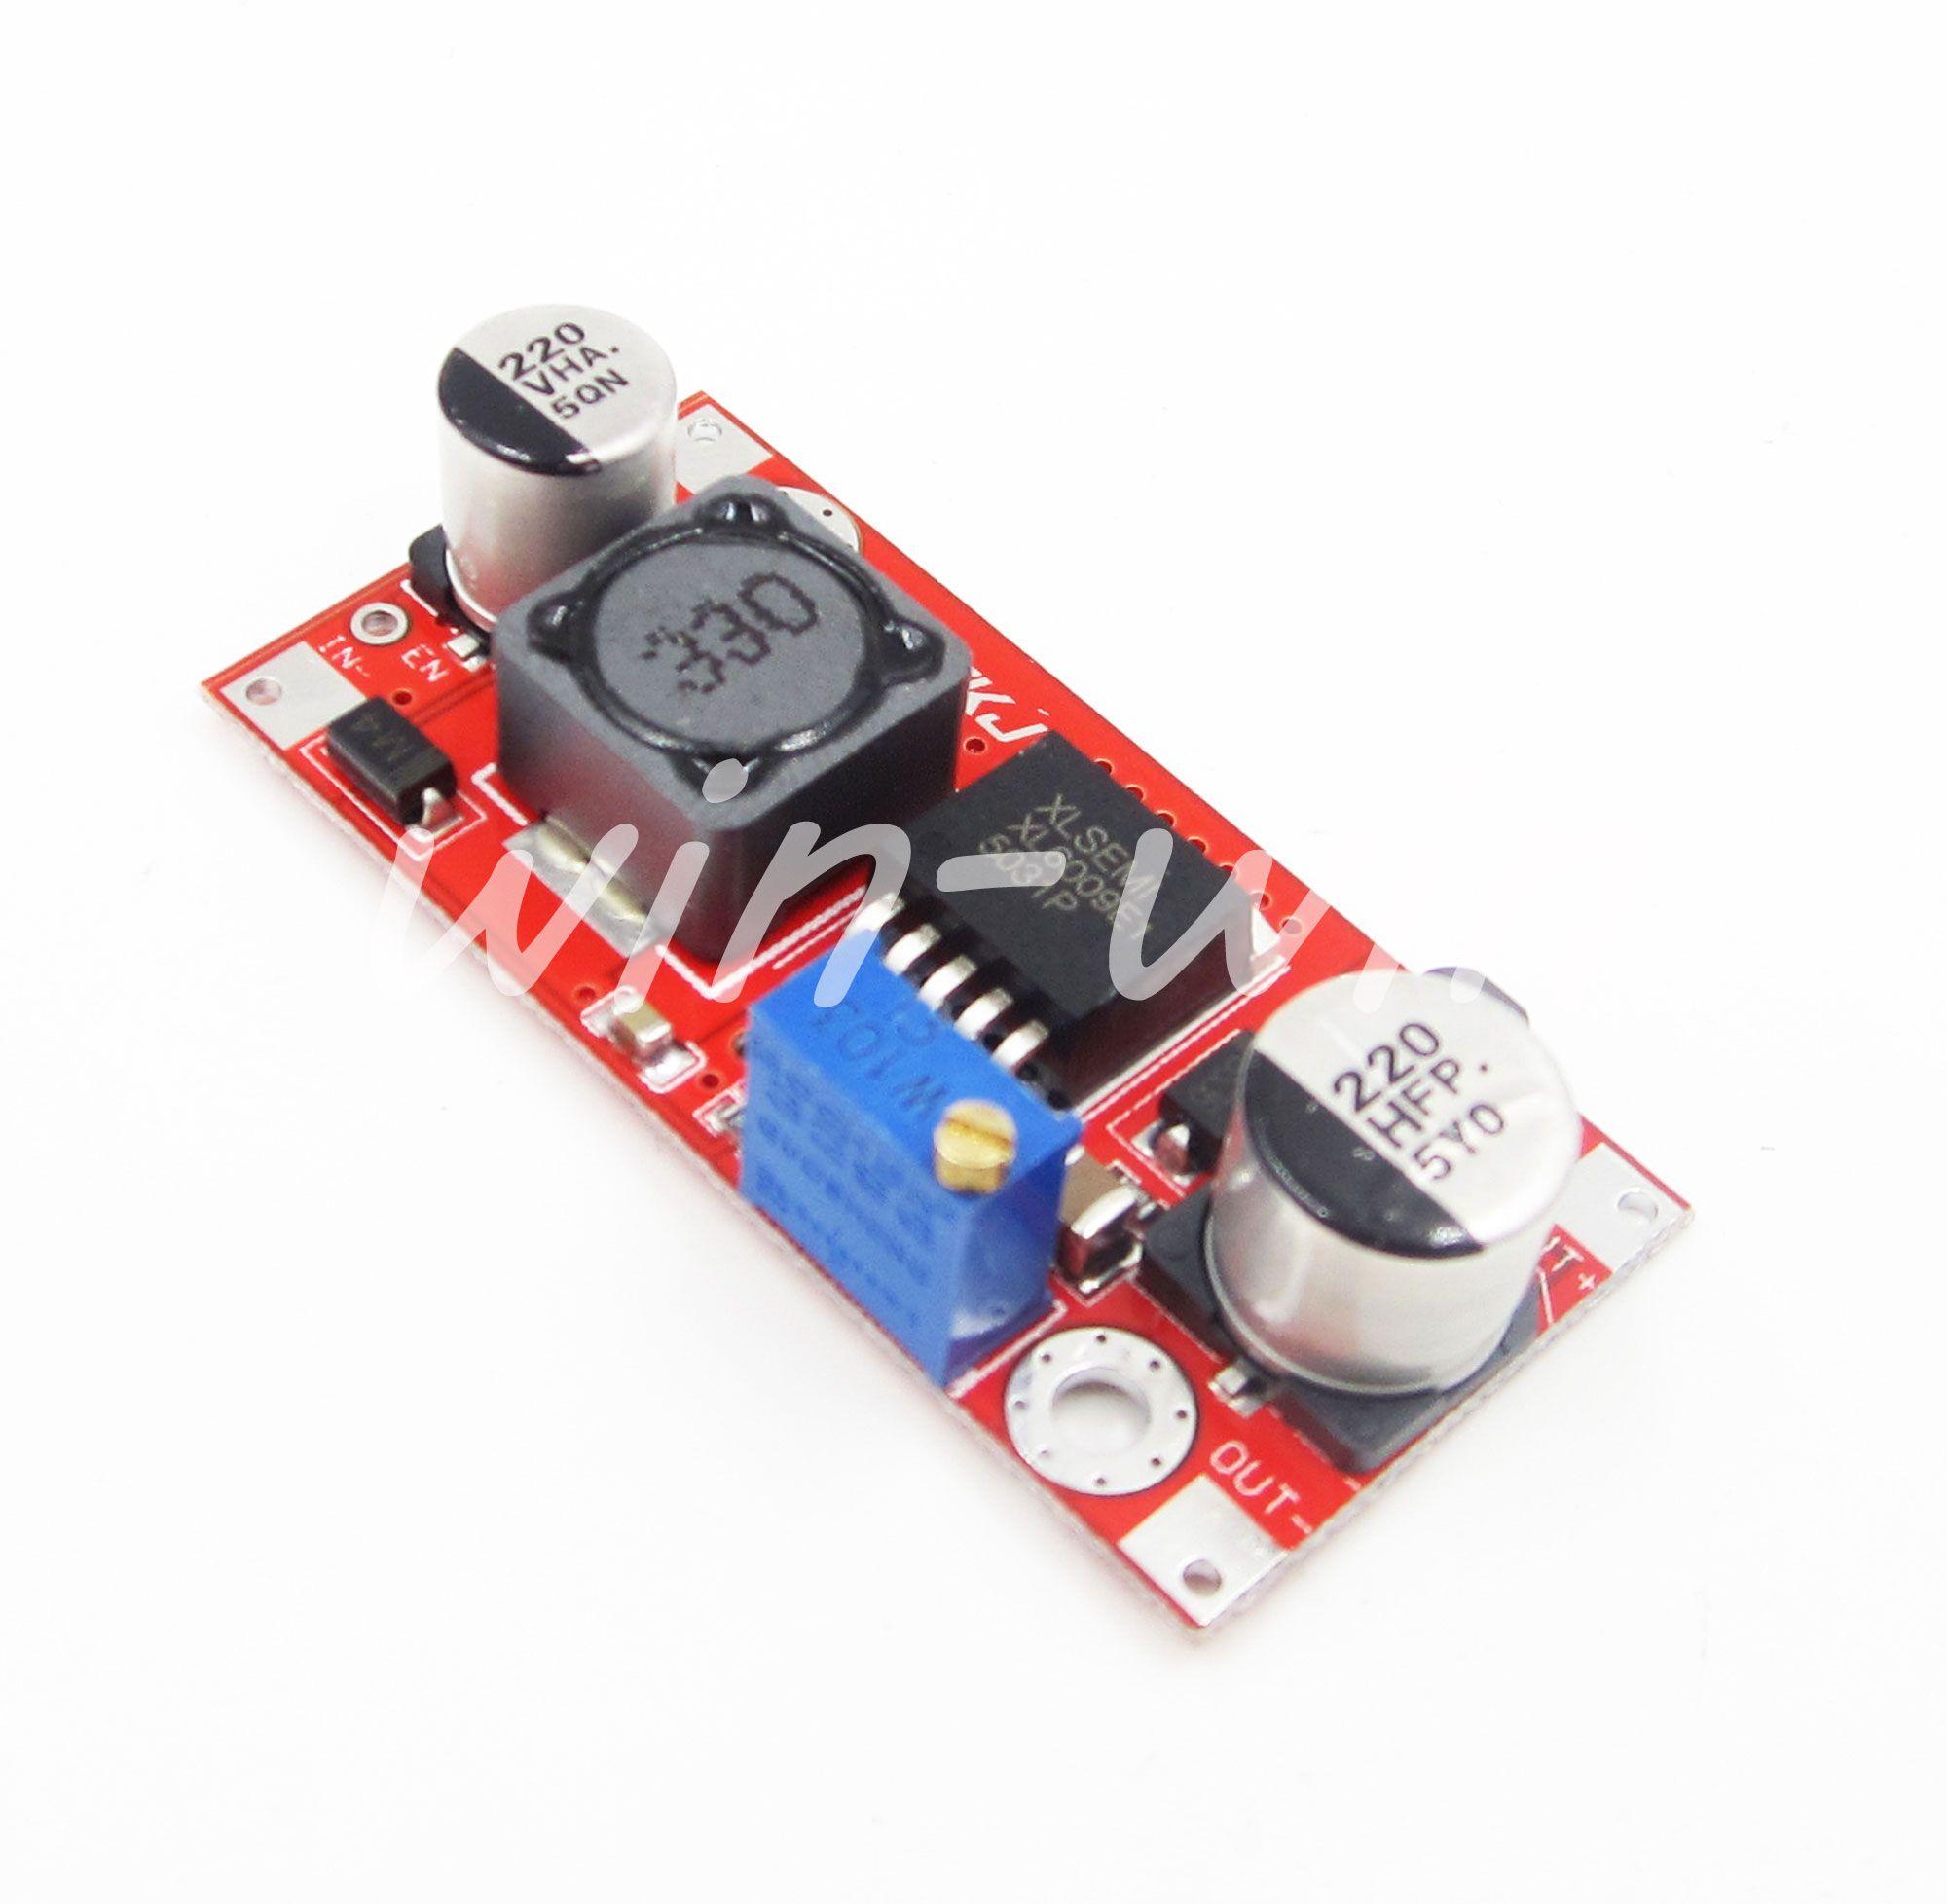 Xl6009 Dc Adjustable Step Up Boost Power Converter Module Replace Stepupconvertercircuitjpg Supply Price Usd